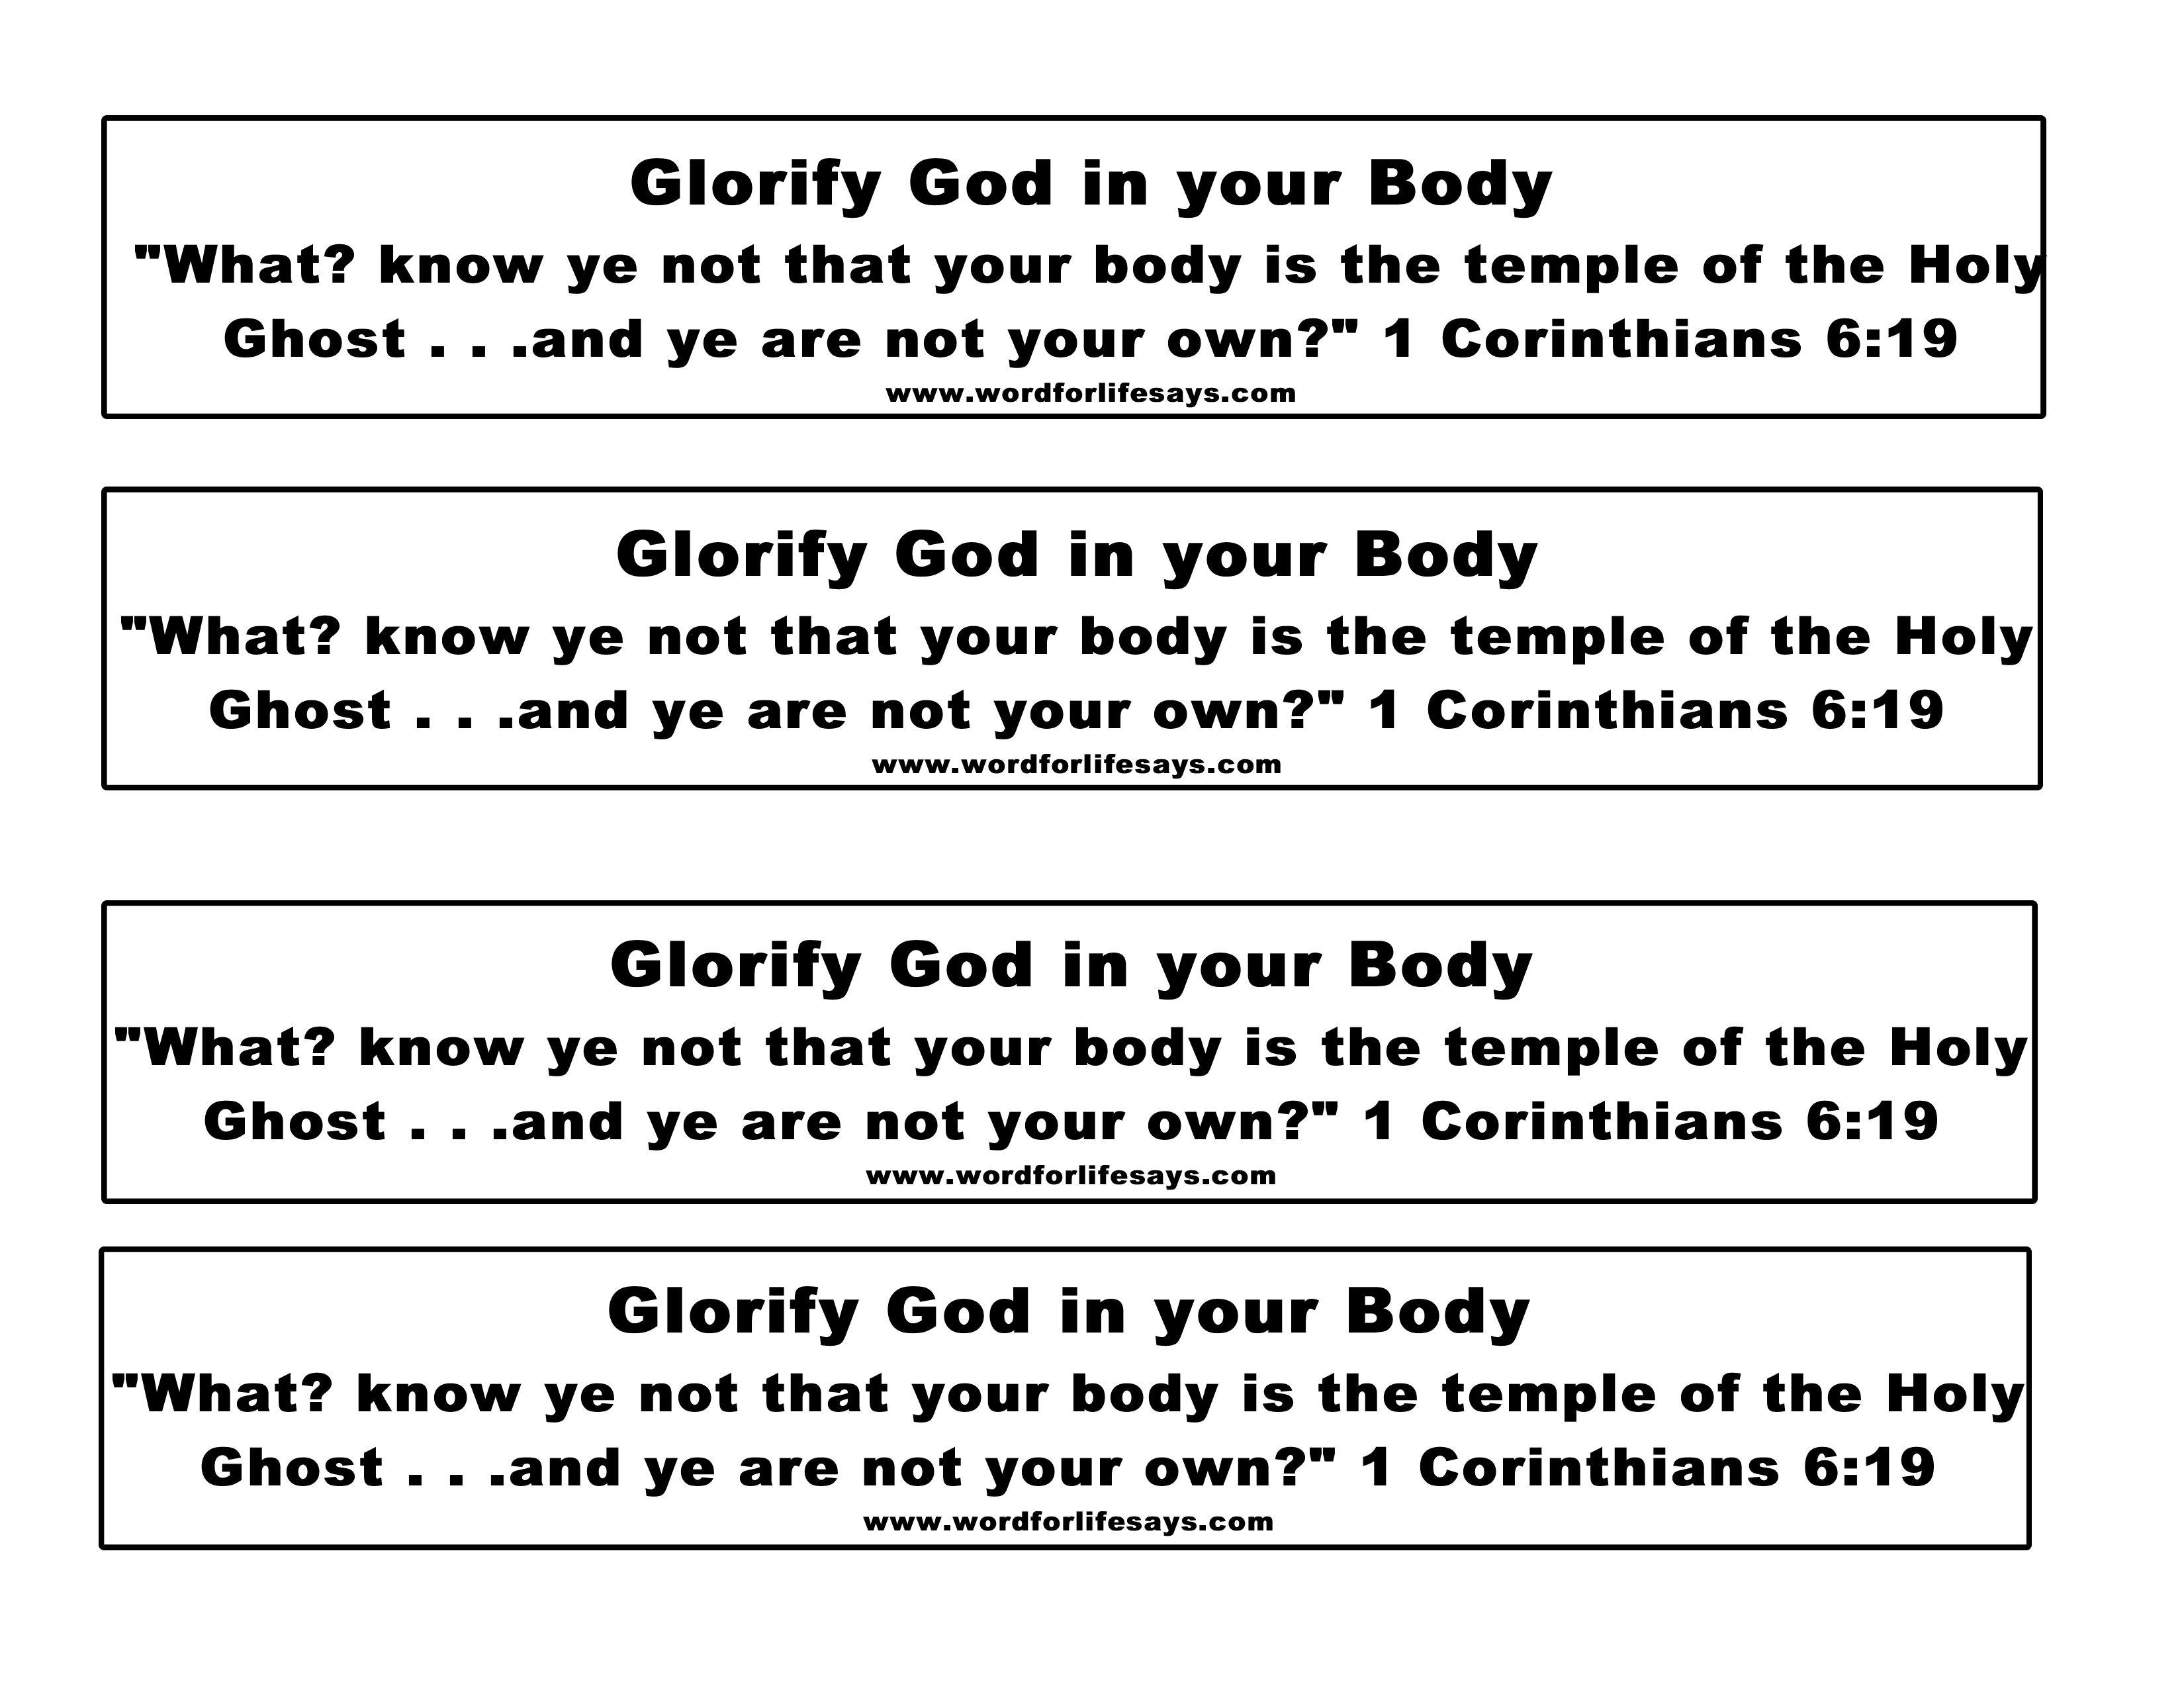 glorify god in your body u201d sunday lesson 1 corinthians 6 12